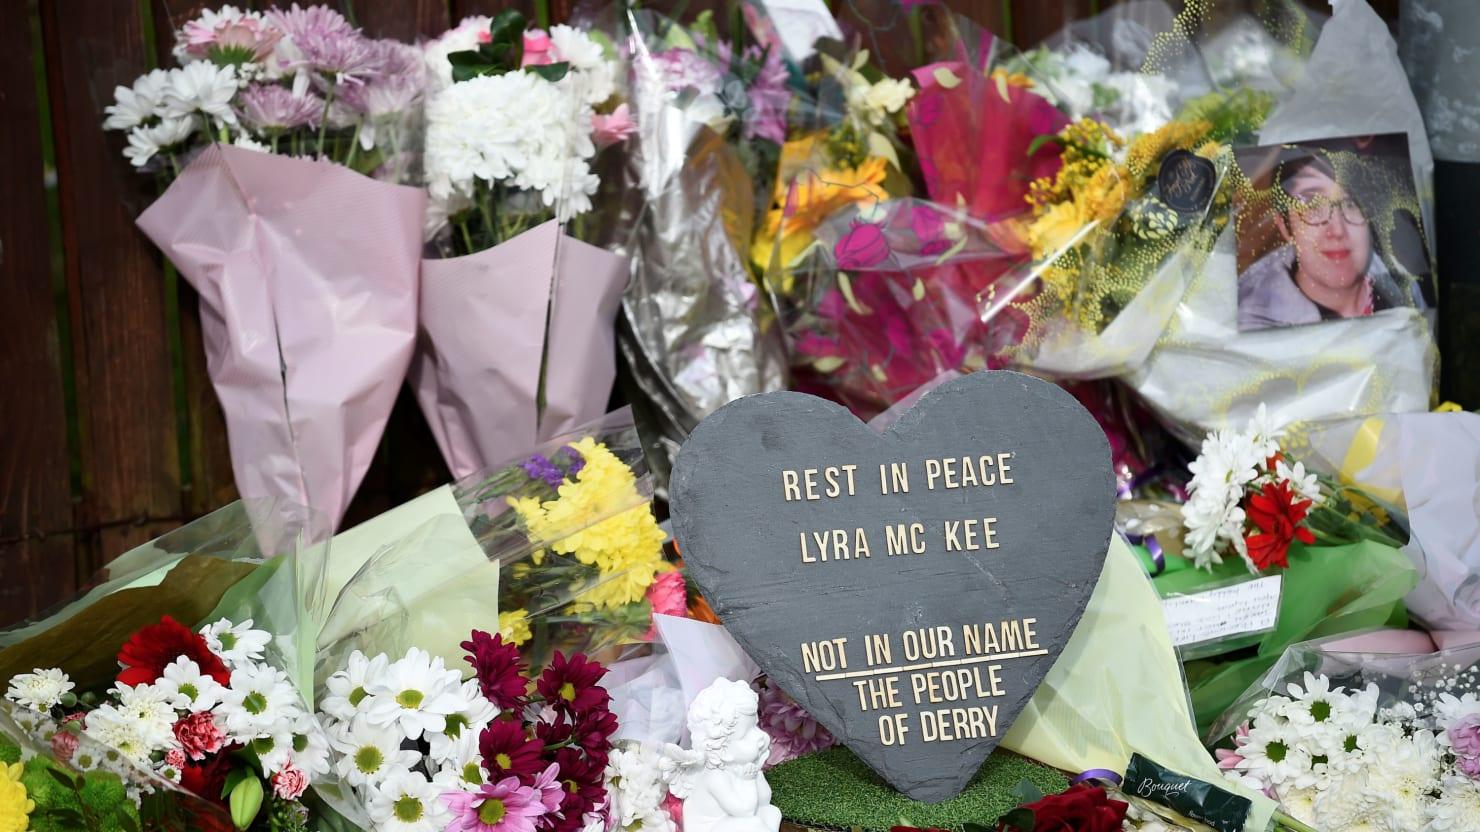 Two Teenagers Arrested in Murder of Northern Ireland Journalist Lyra McKee